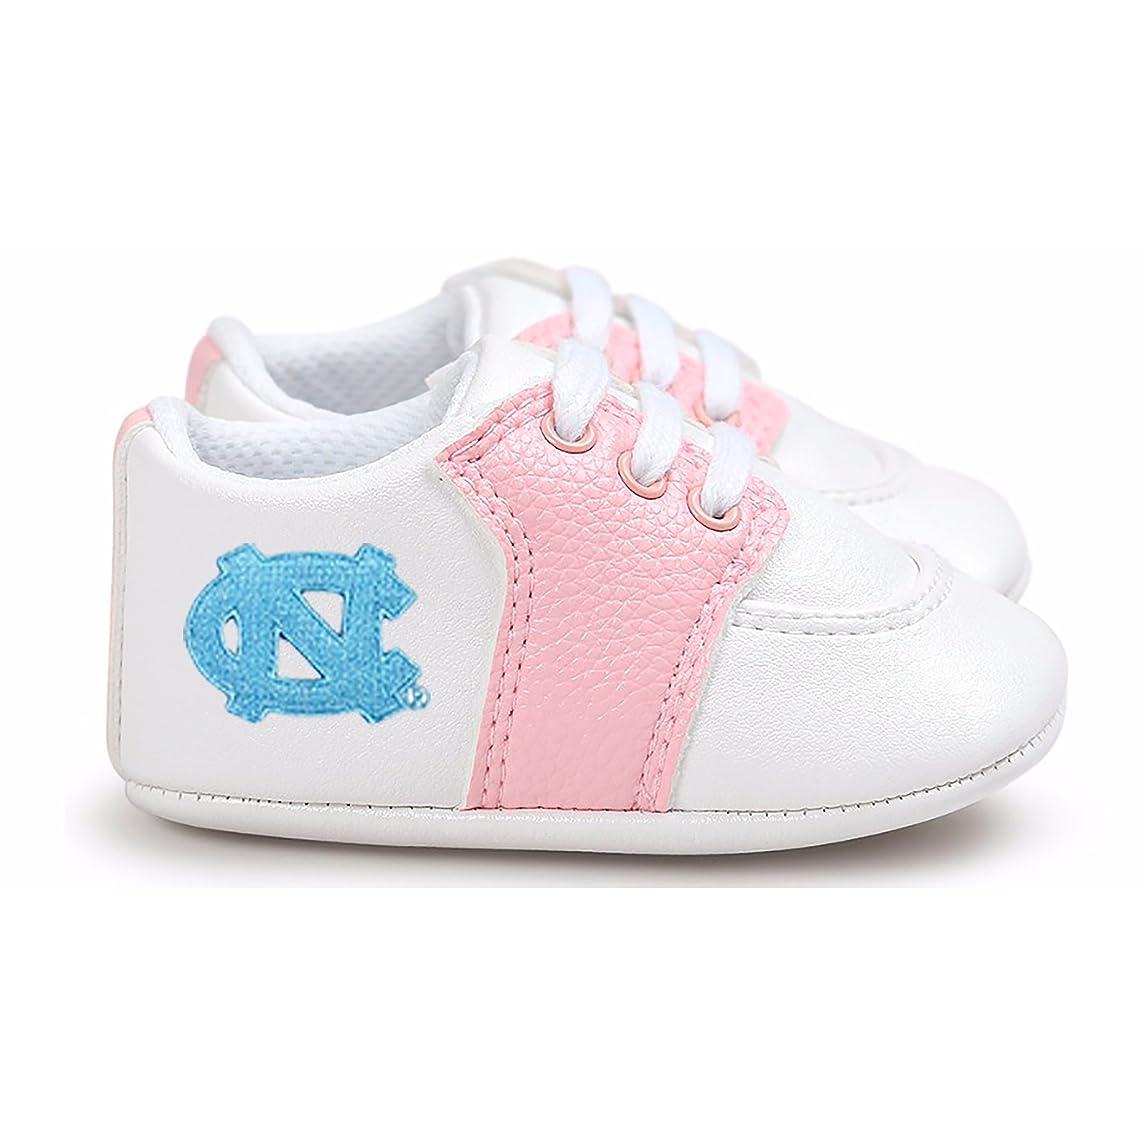 Future Tailgater North Carolina UNC Tar Heels Pre-Walker Baby Shoes - Pink Trim